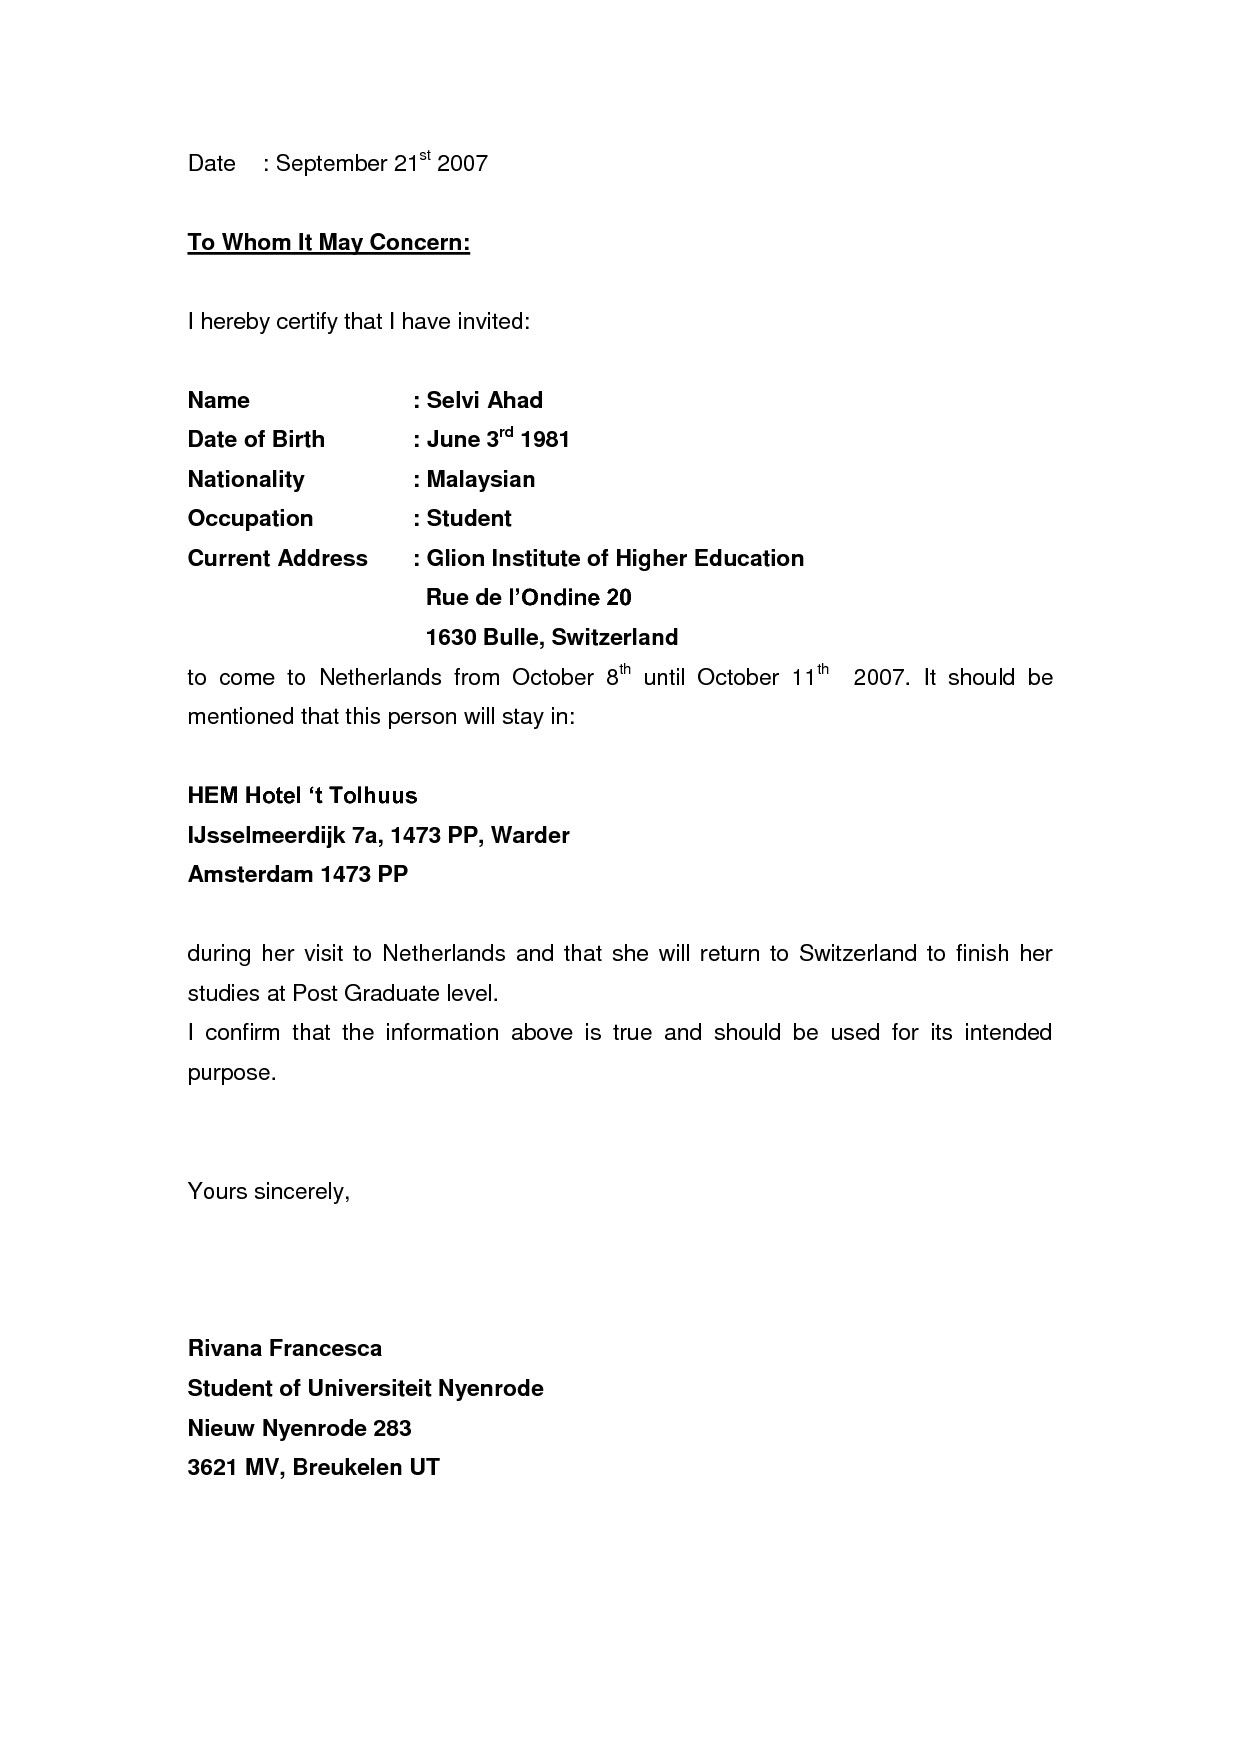 invitation letter format for schengen